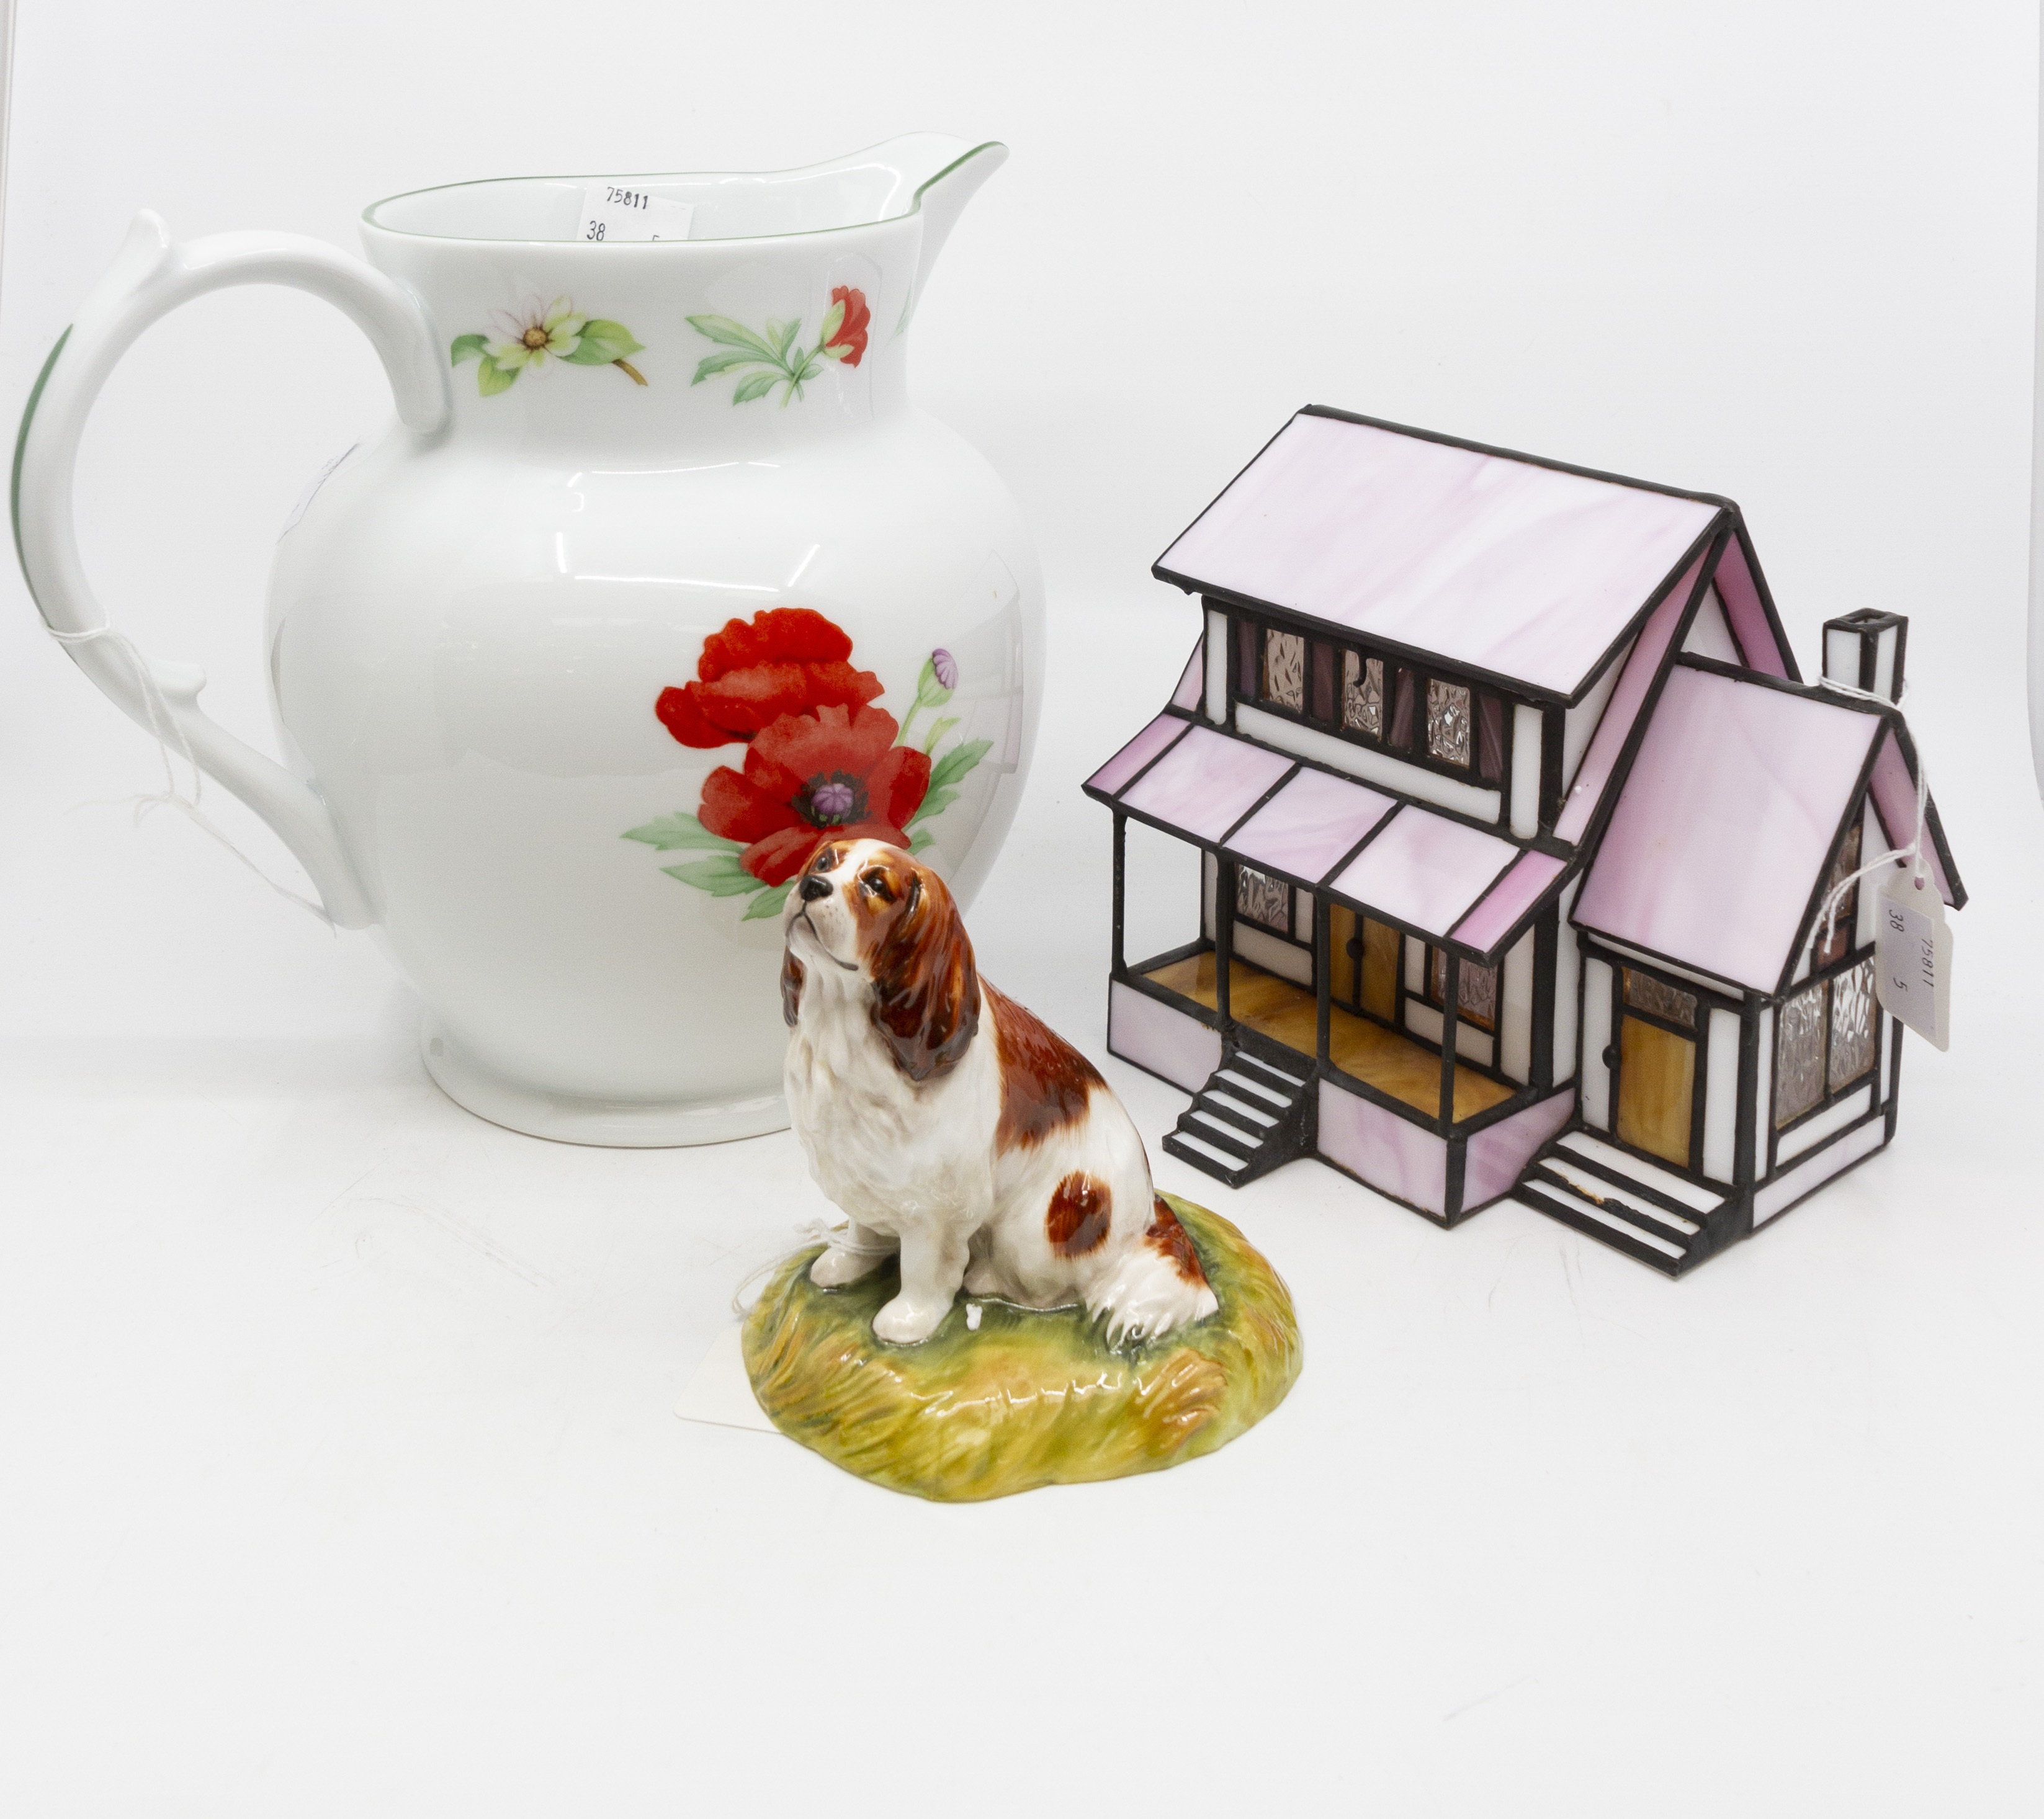 Lot 1257 - Ceramics to include Royal Worcester Poppy Jug, Royal Stratford Cavalier King Charles,